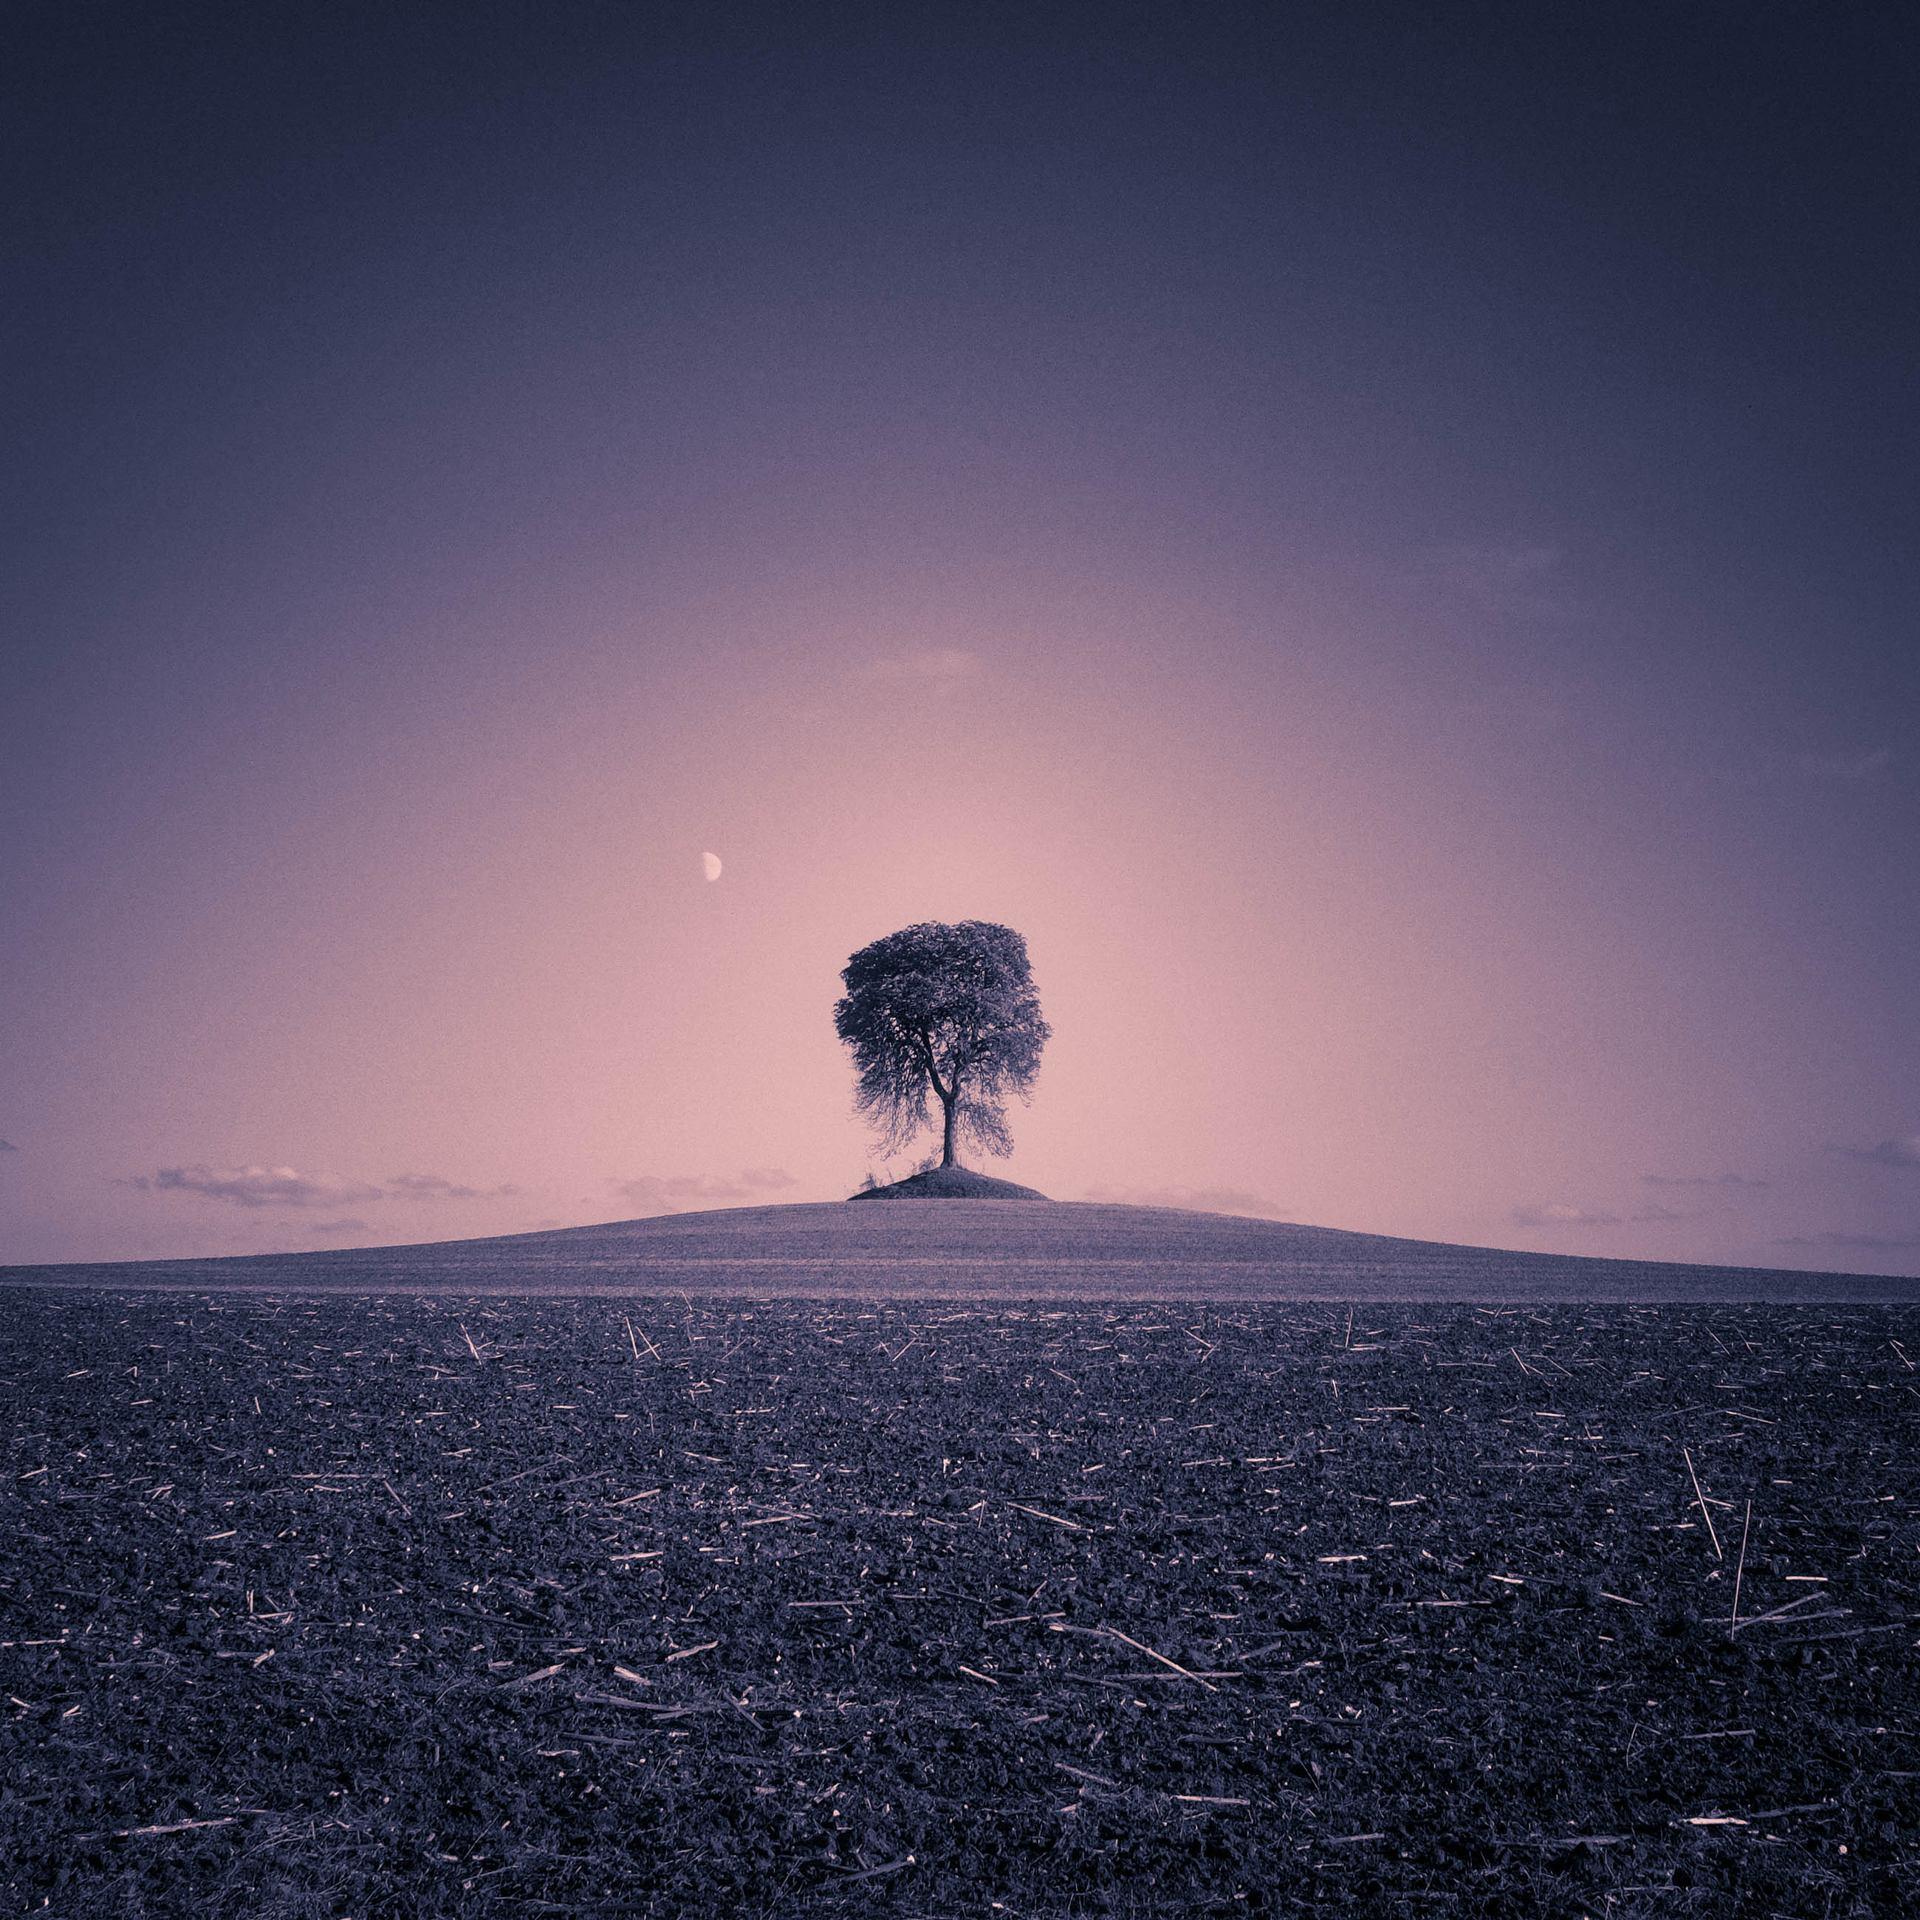 Grand arbre tout petit.